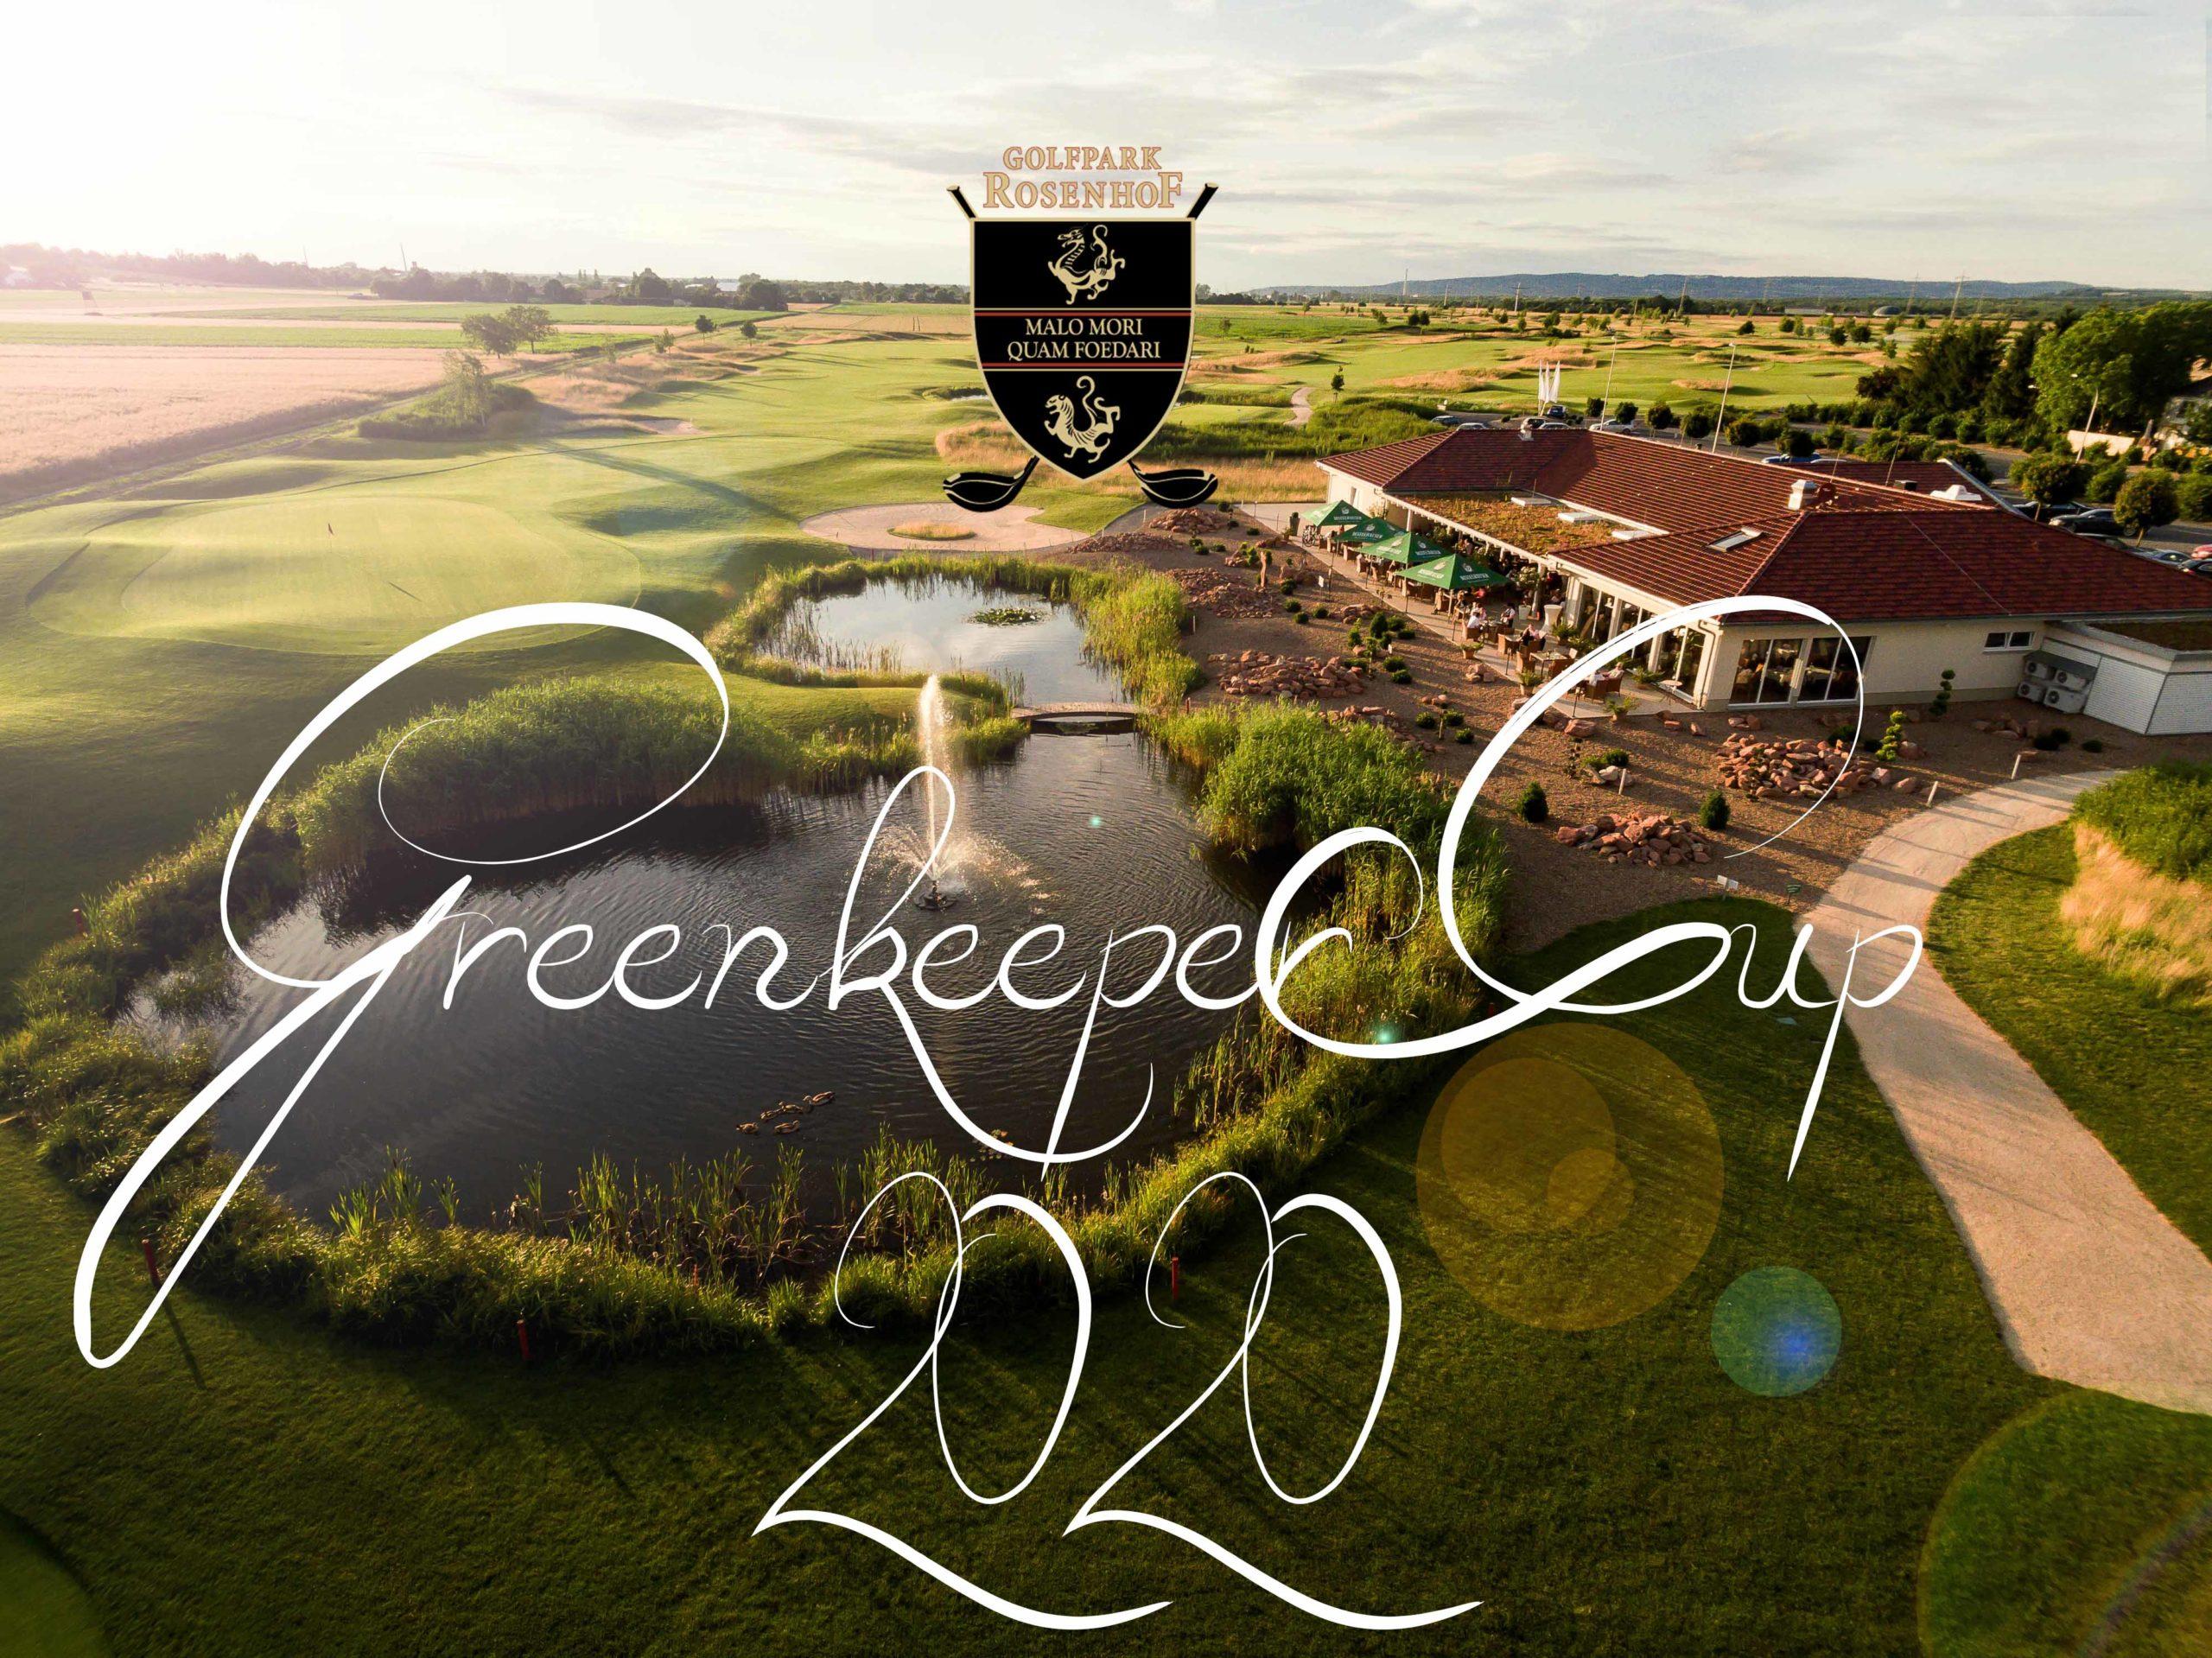 Samstag, 10. Oktober 2020 – Greenkeeper Cup